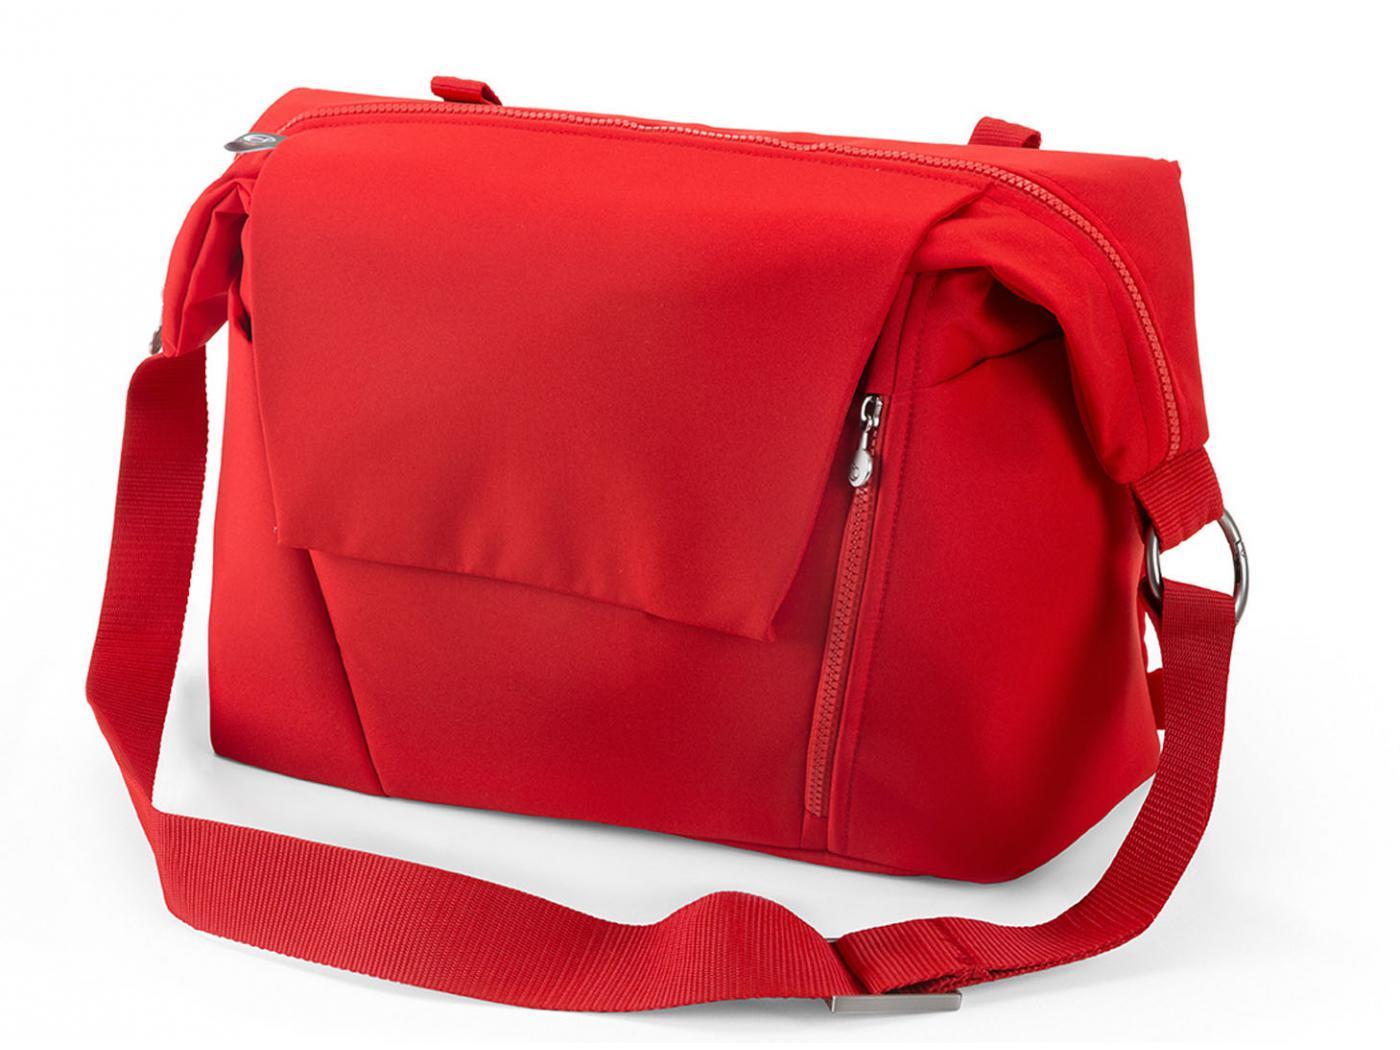 stokke nouveau sac langer rouge pour poussette stokke. Black Bedroom Furniture Sets. Home Design Ideas